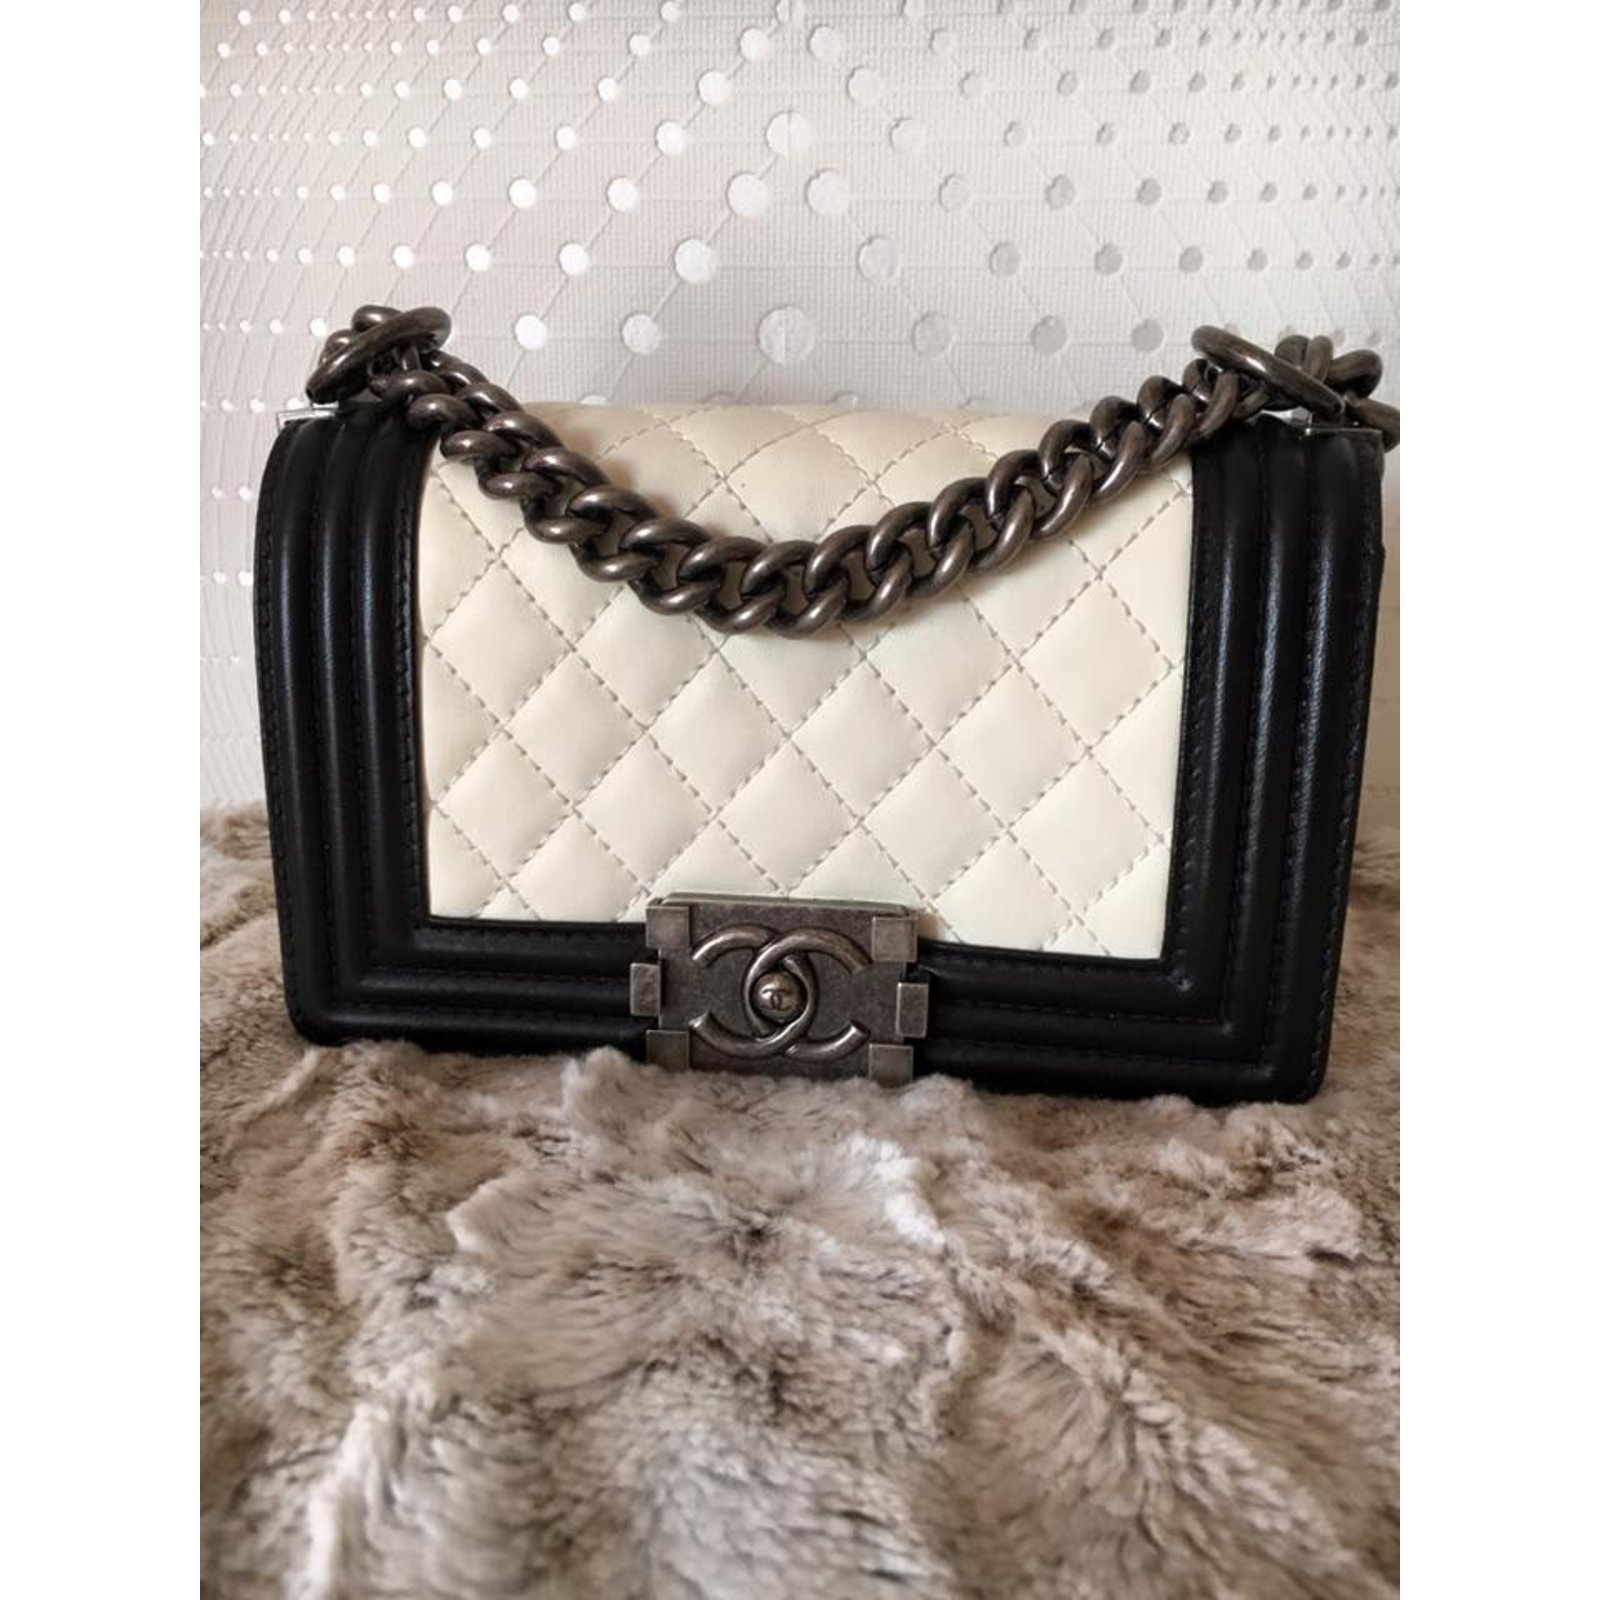 Sac A Main Chanel Blanc Et Noir : Sacs ? main chanel boy noir et blanc cuir ref